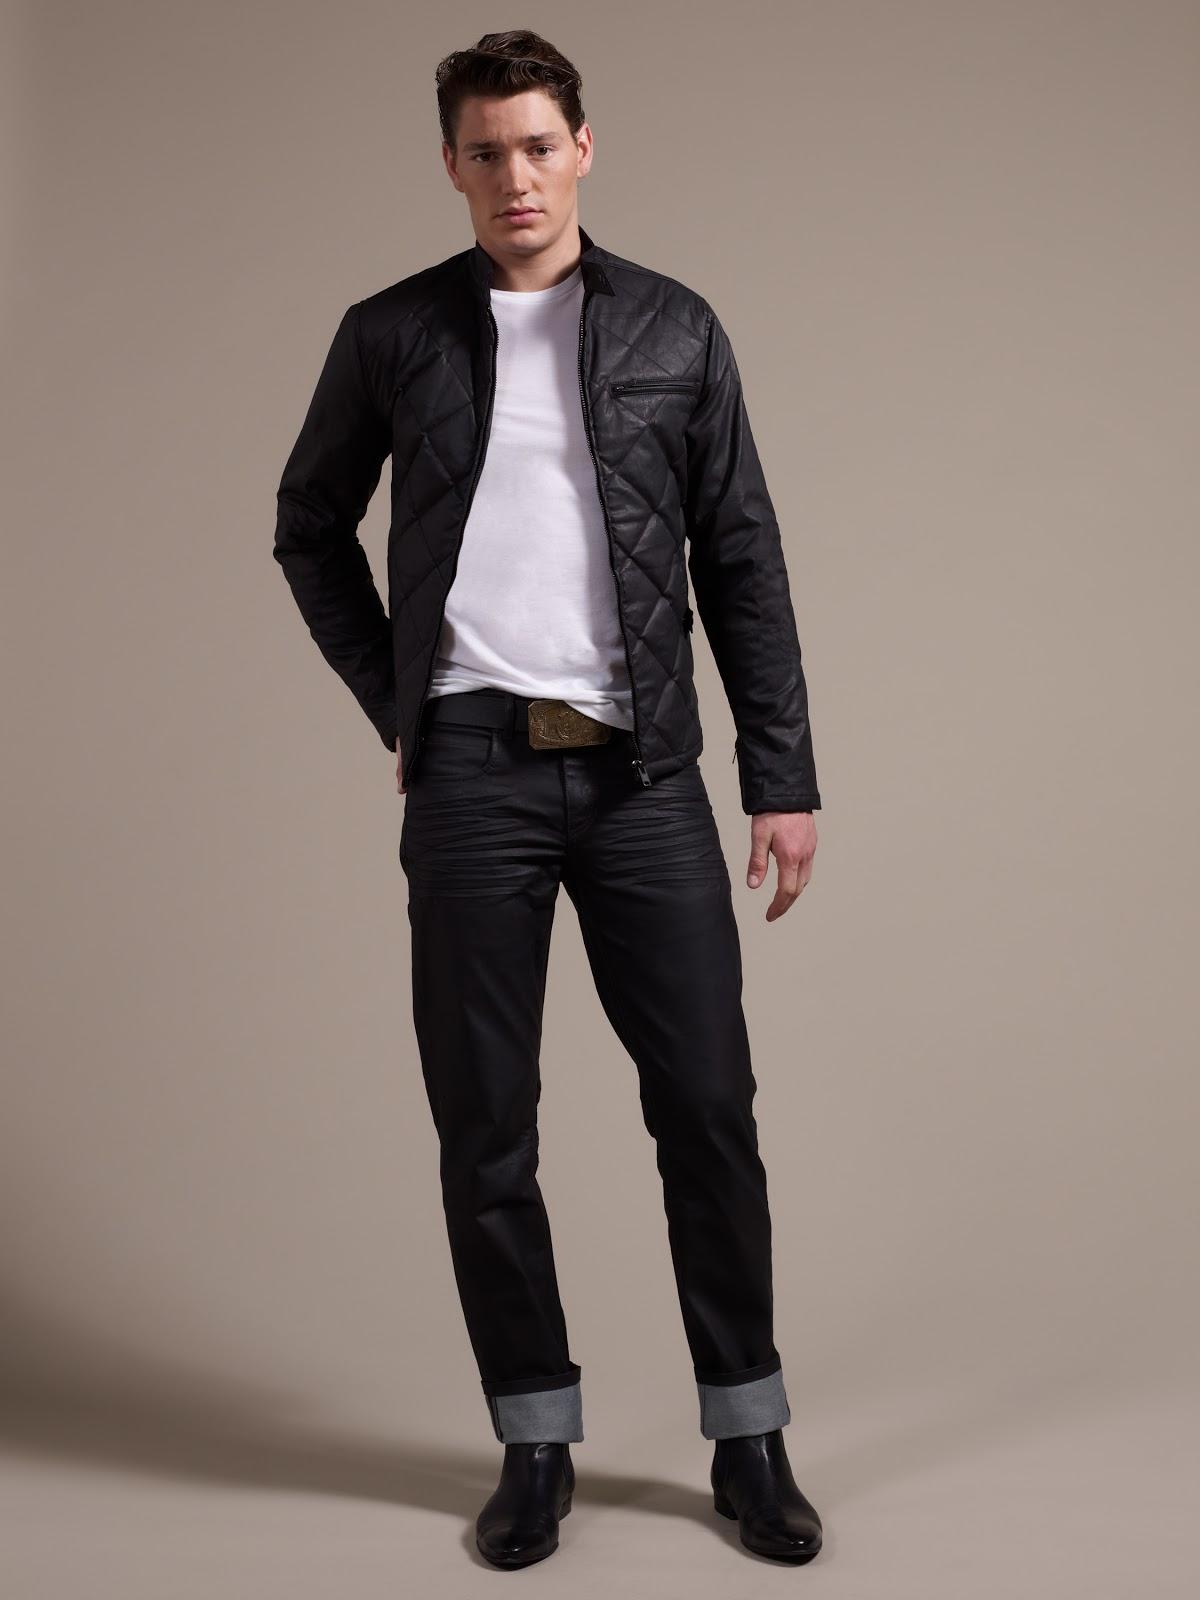 1950 s men fashion clothing newhairstylesformen2014 com